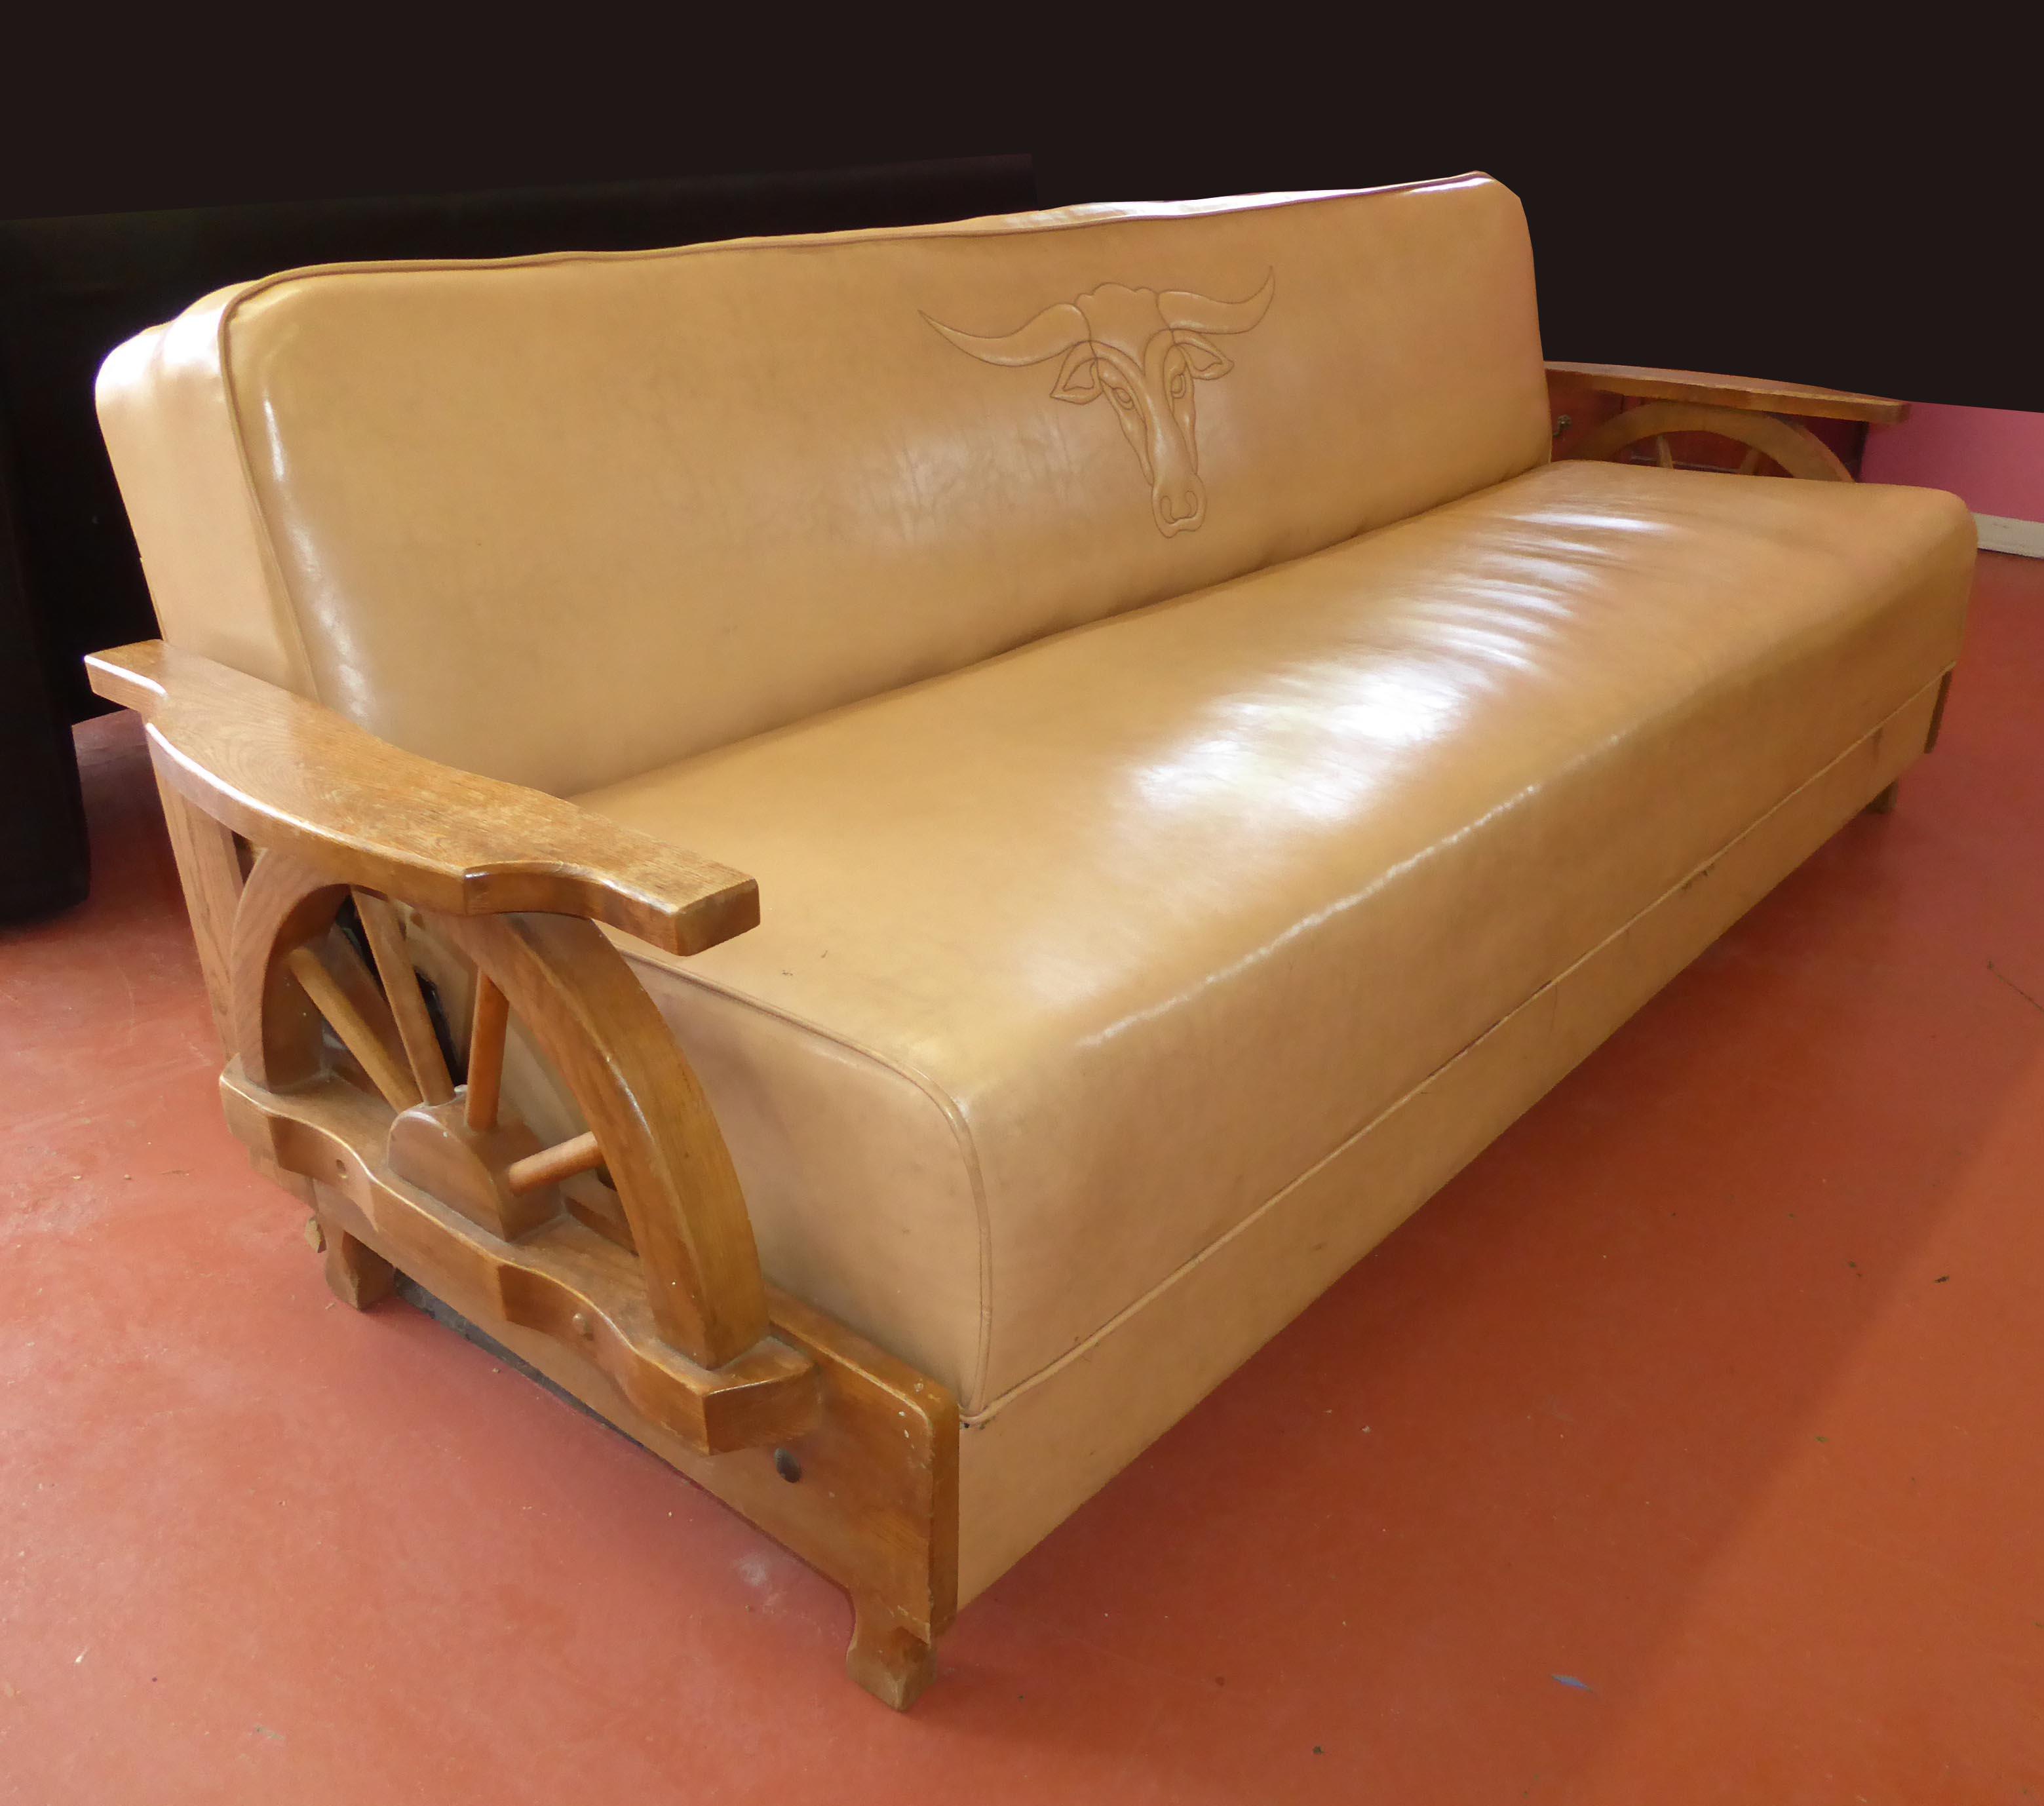 Marvelous Vintage Cowboy Wagon Wheel Sleeper Sofa U0026 Rocking Chair WHAT A FIND!